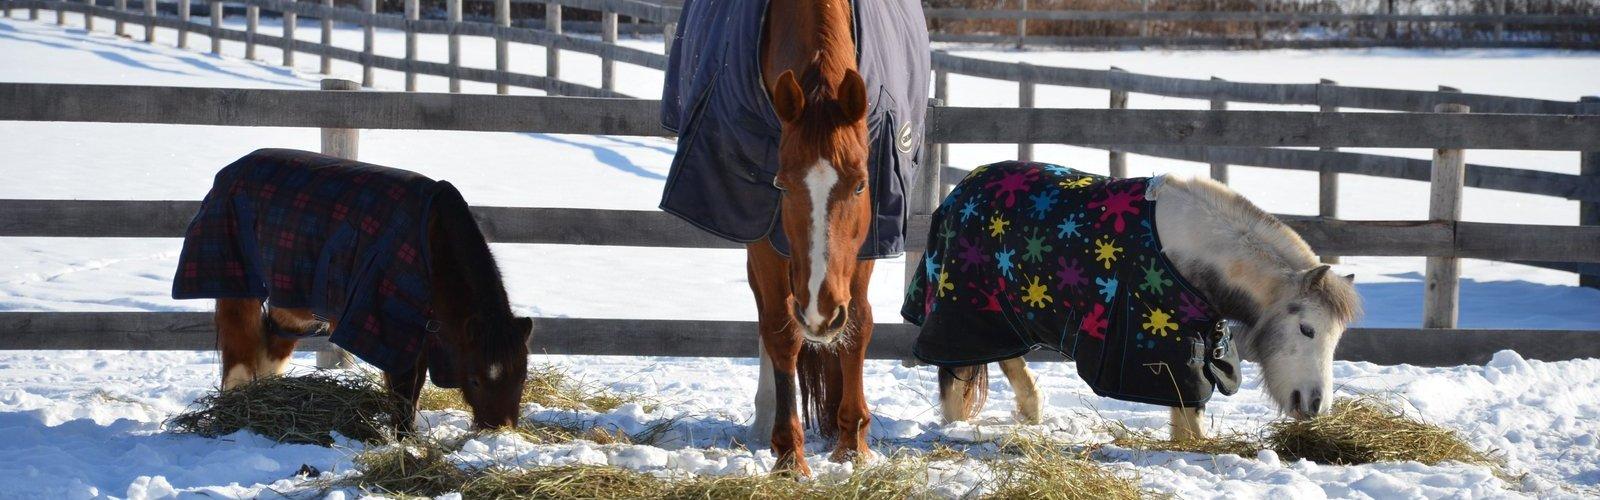 Mac & Ponies - Winter